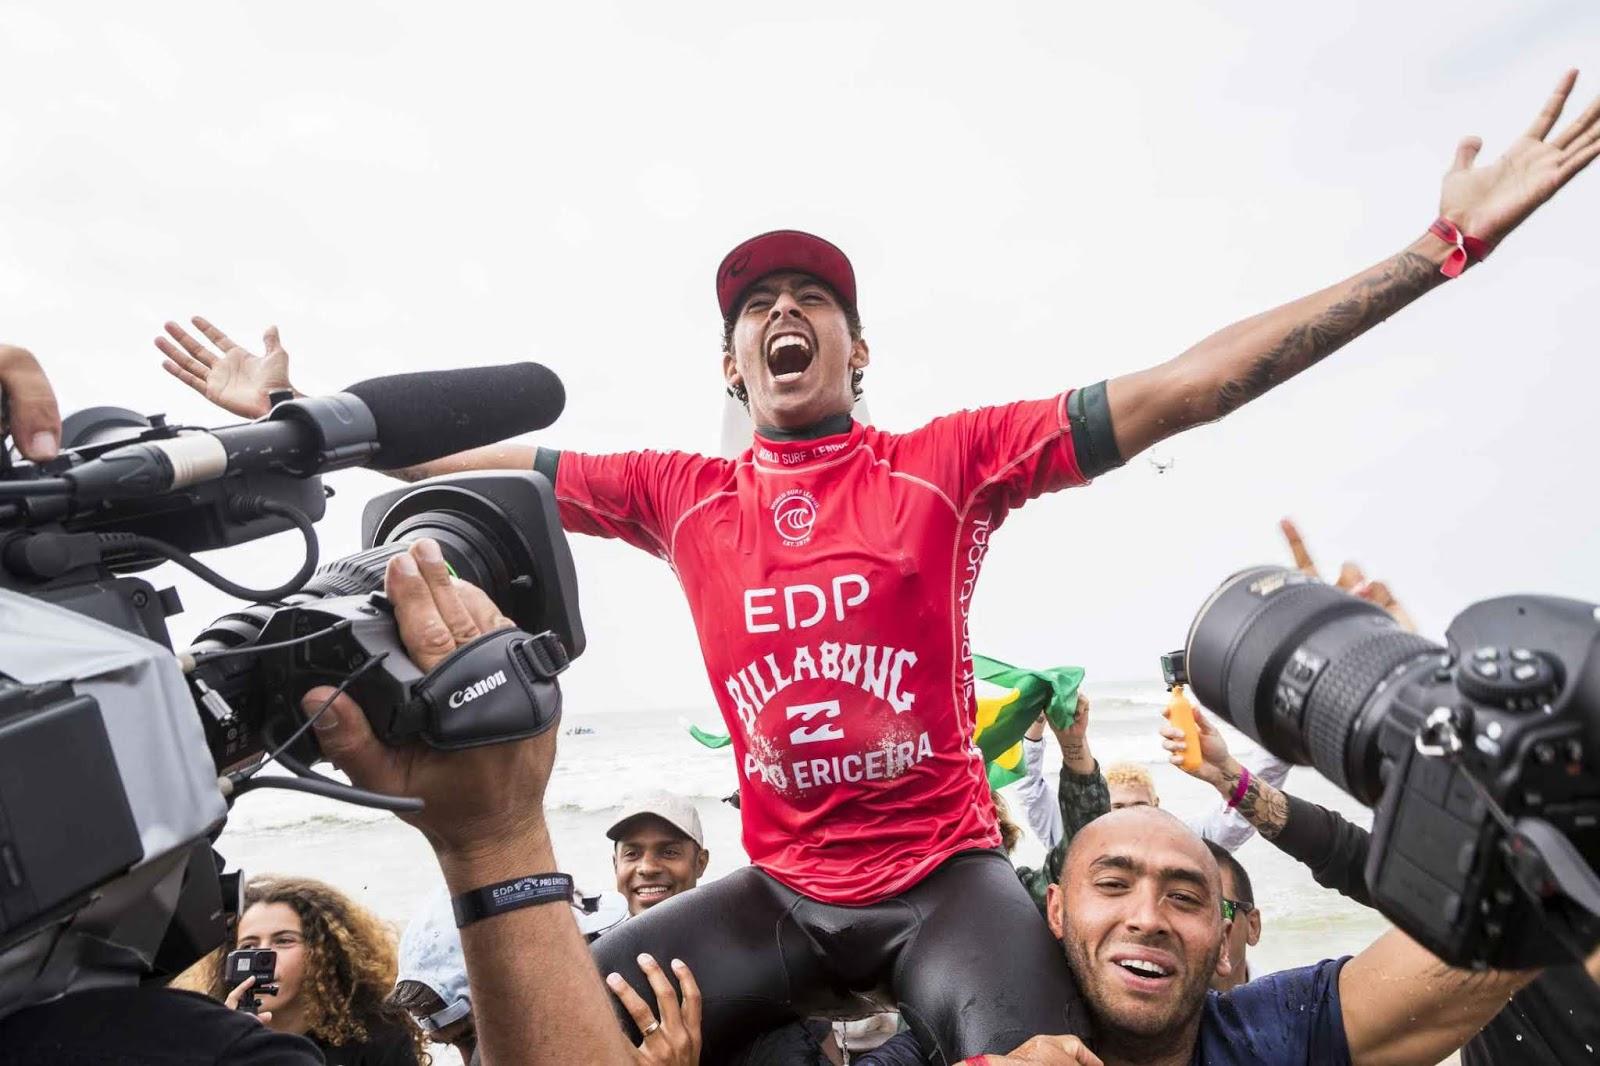 It s Samuel Pupo s Time to Shine EDP Billabong Pro Ericeira Final Highlights